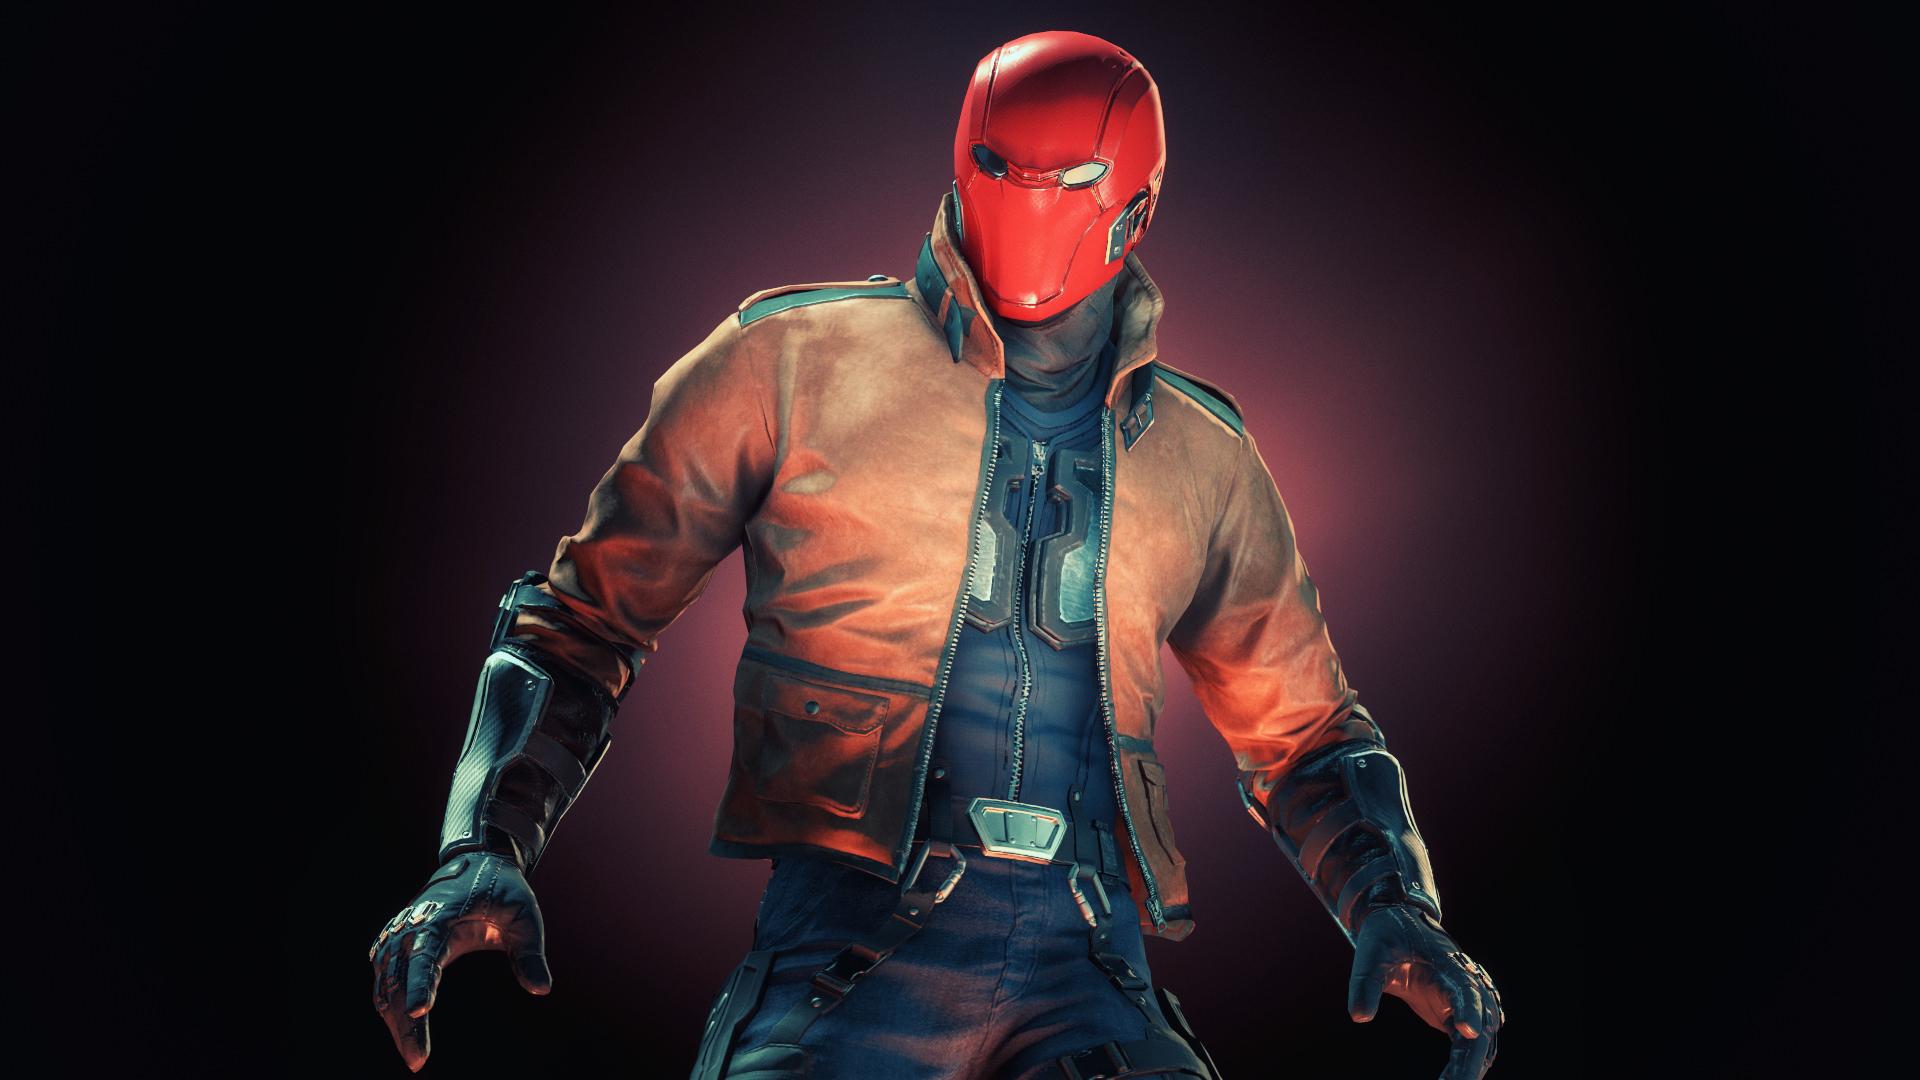 Steam Workshop :: Injustice 2 - Red Hood